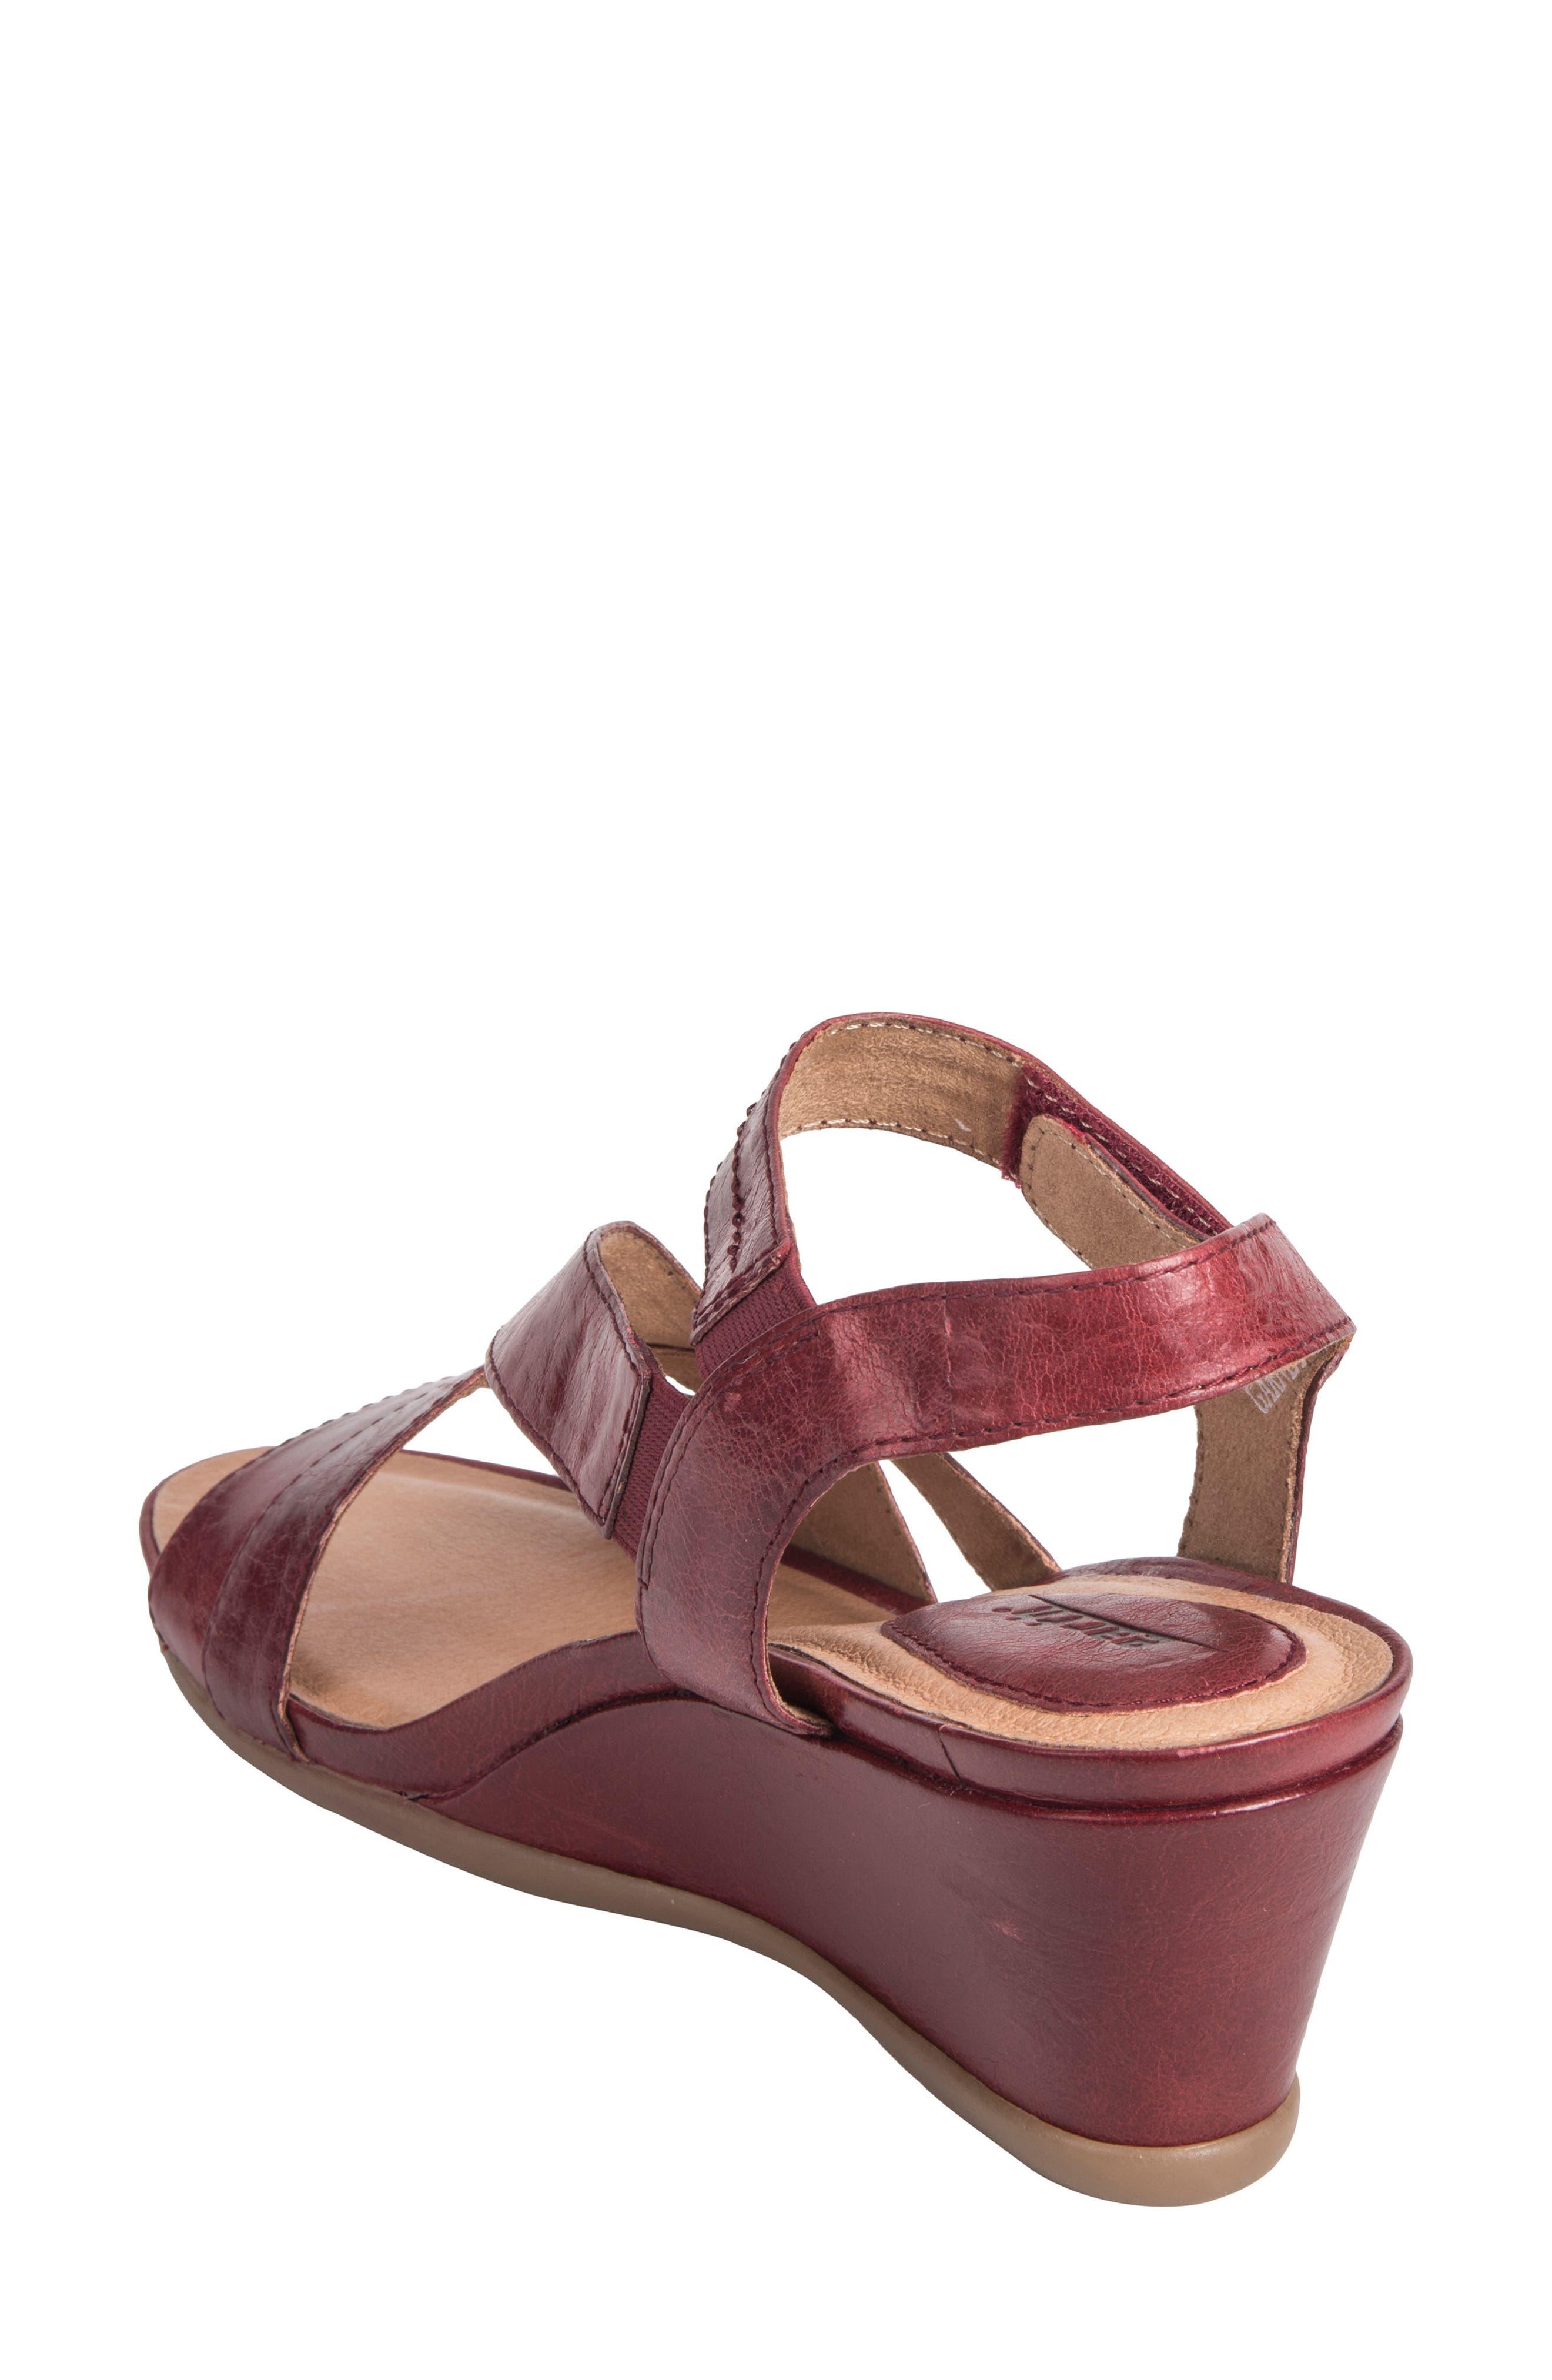 Thistle Wedge Sandal,                             Alternate thumbnail 7, color,